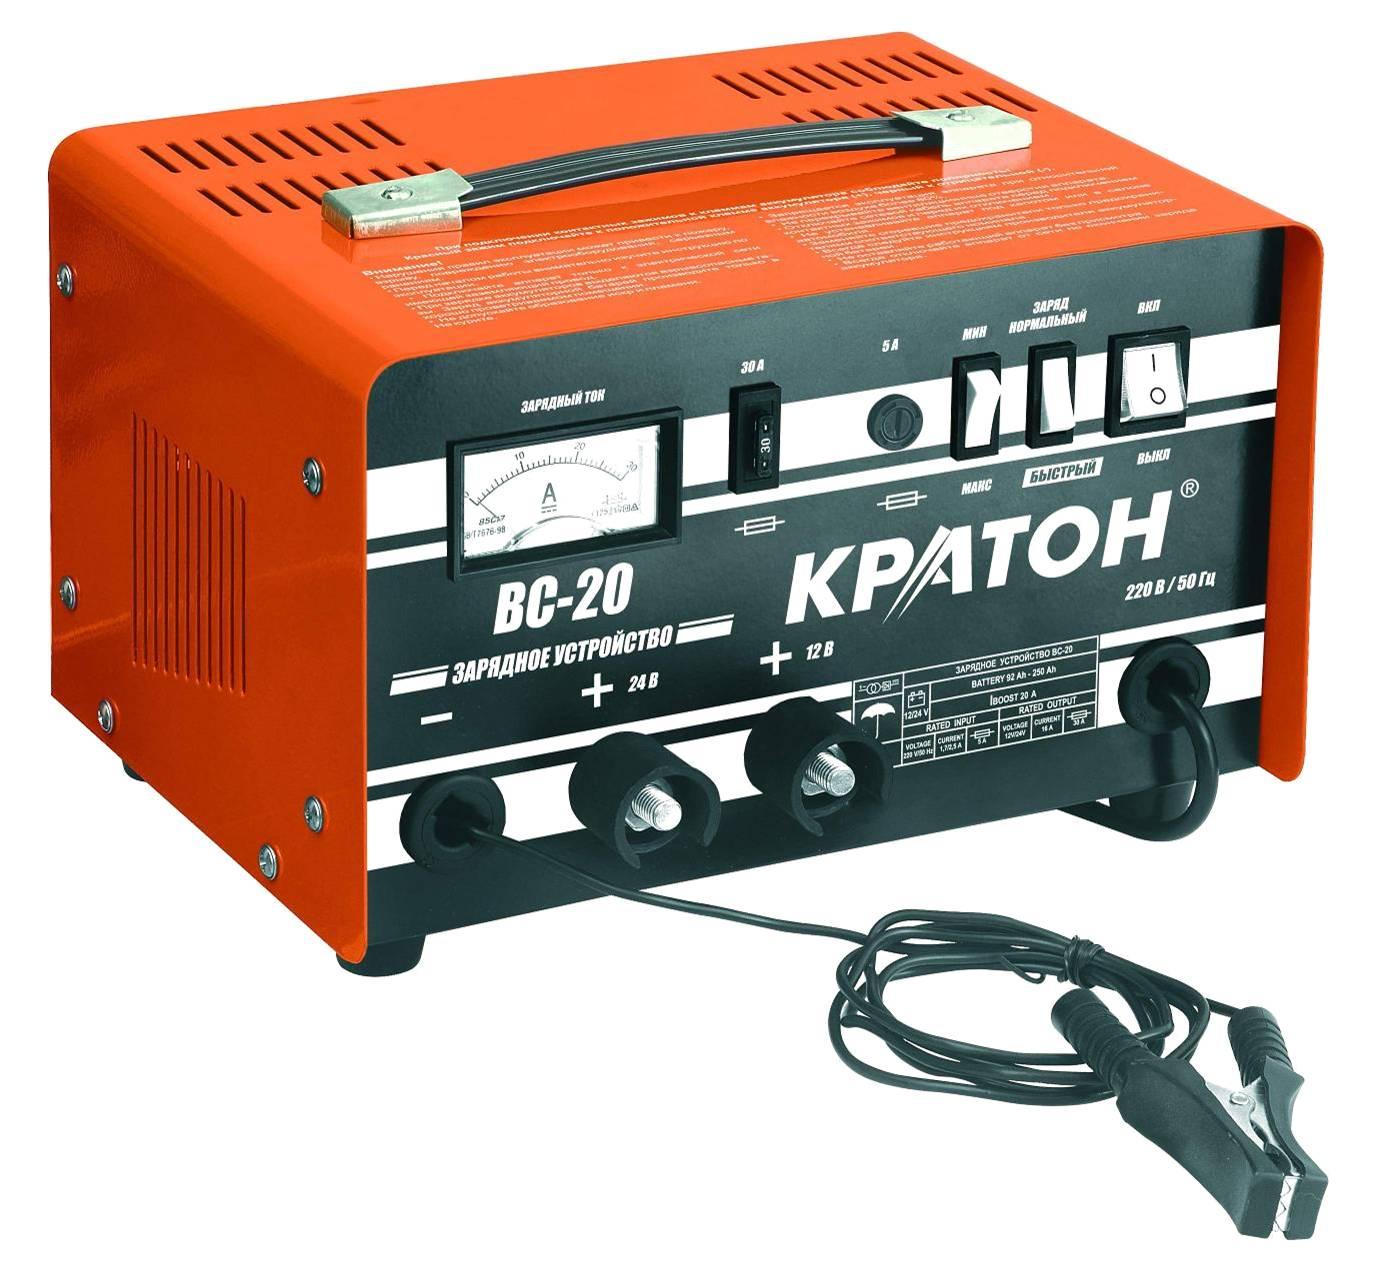 Купить Зарядное устройство КРАТОН Bc-20